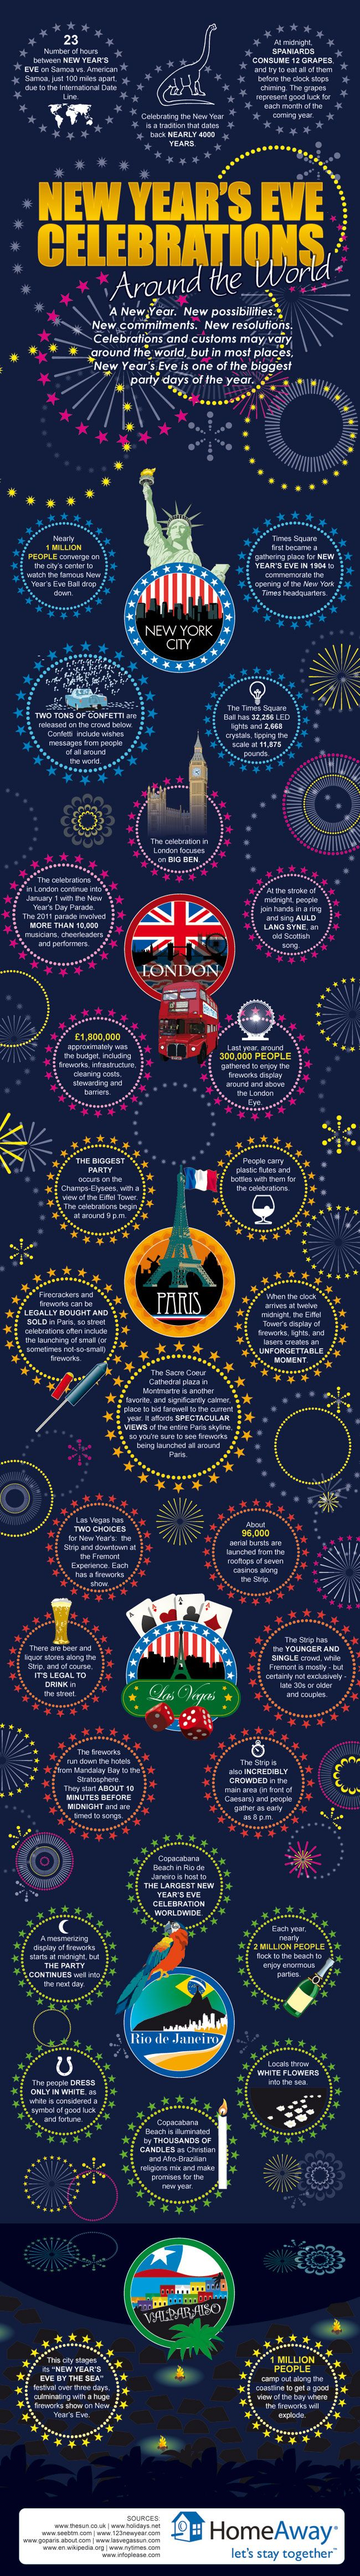 New Year's Eve celebrations around the world infographic